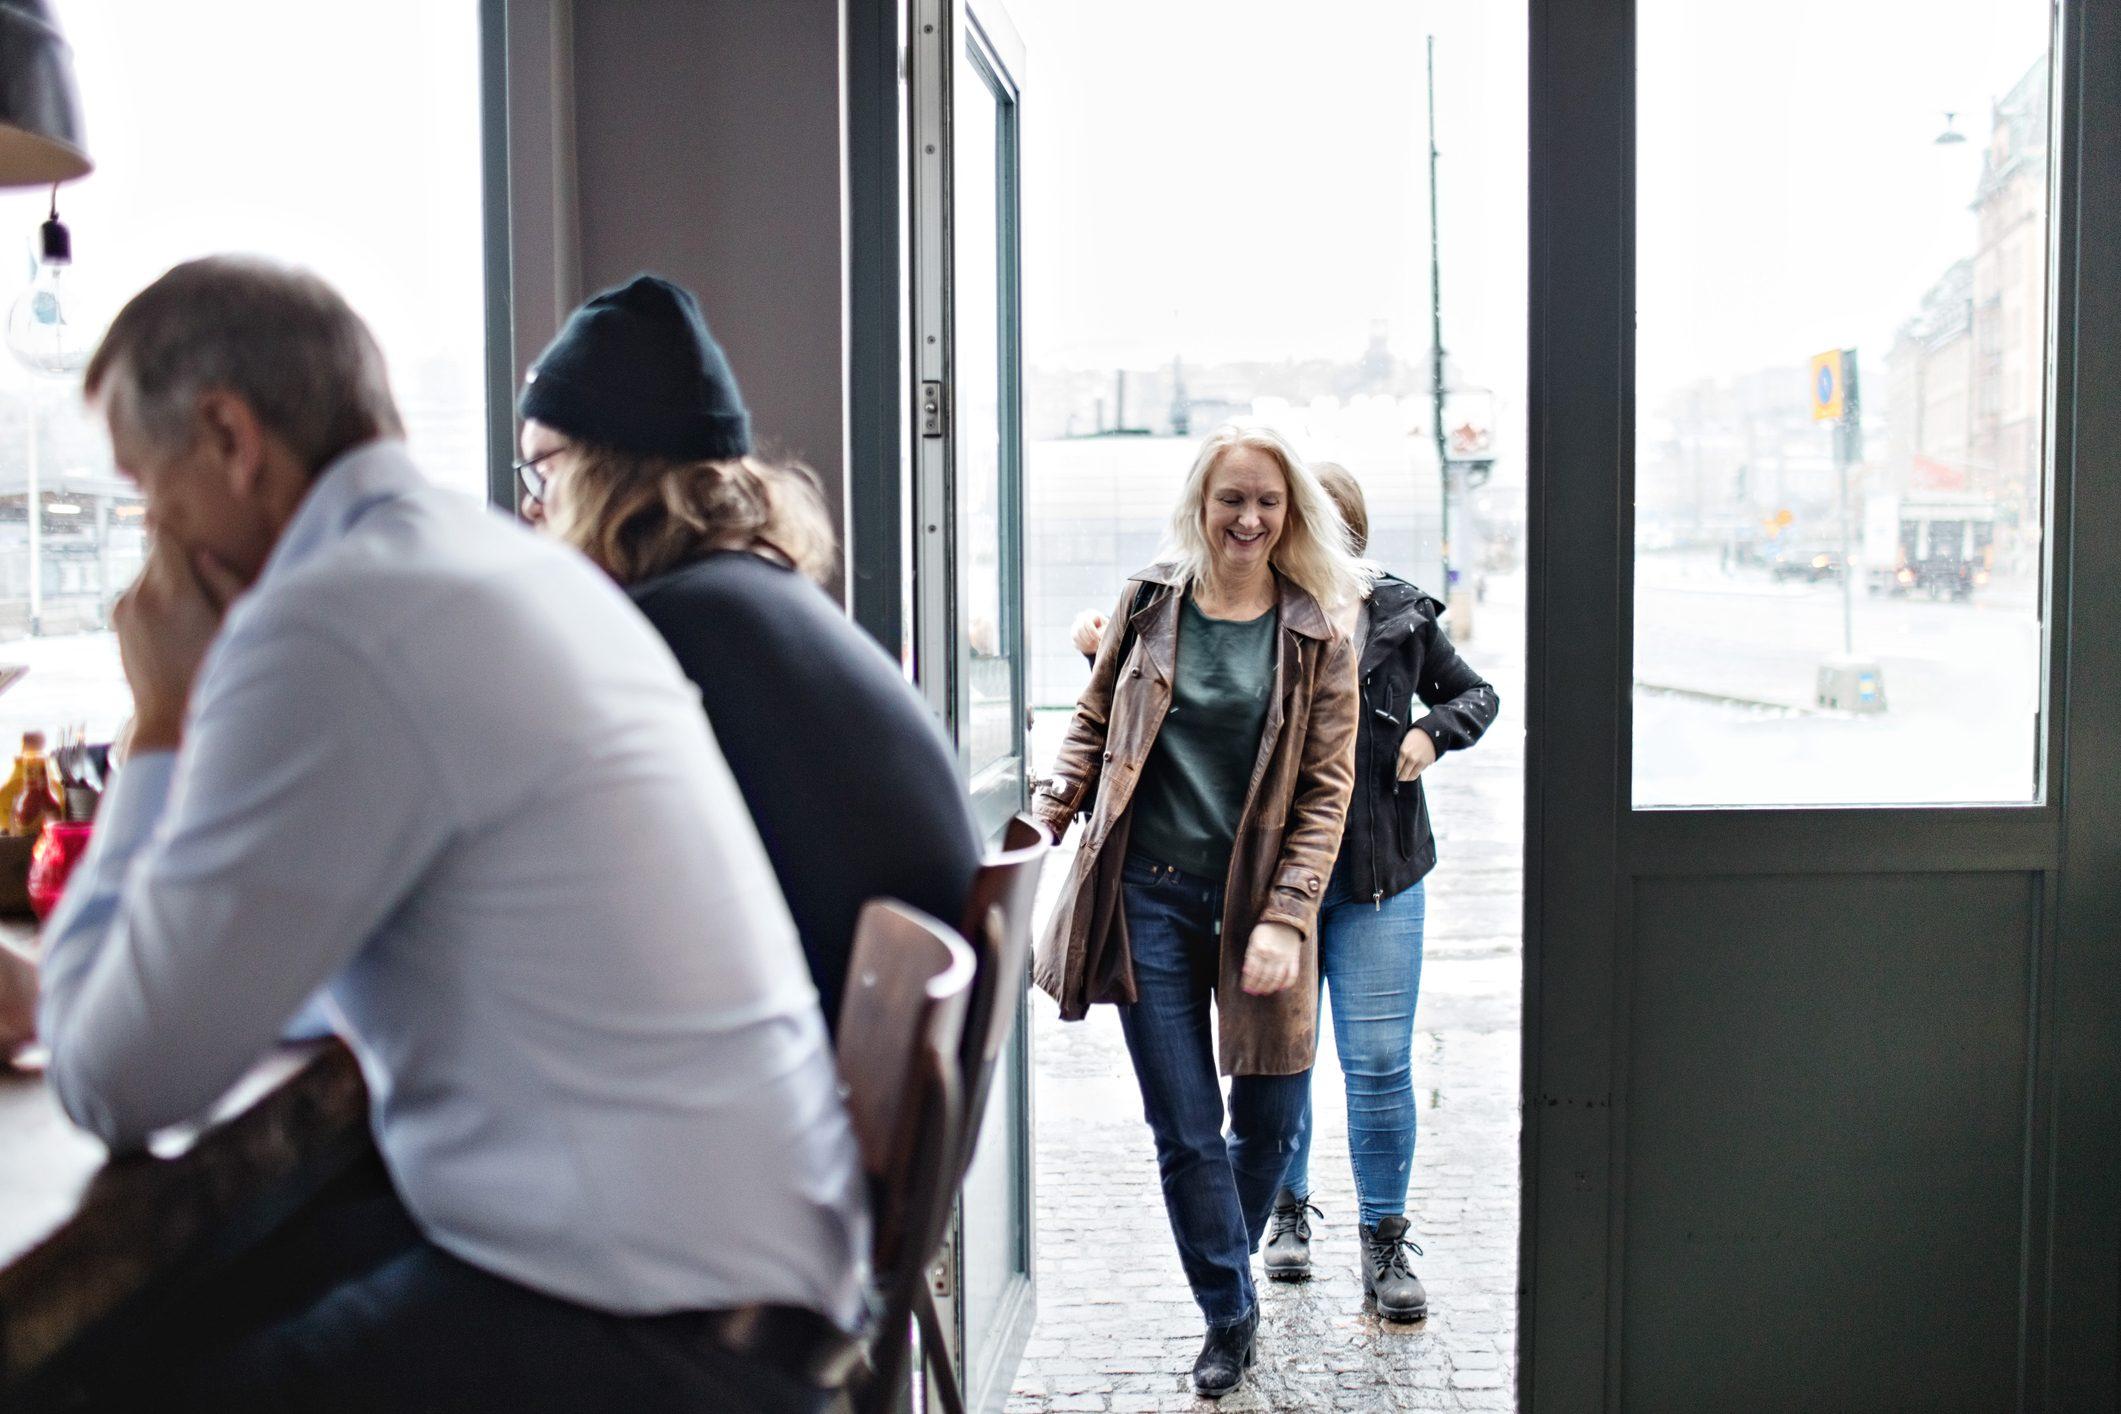 Women entering from open door while men sitting at restaurant